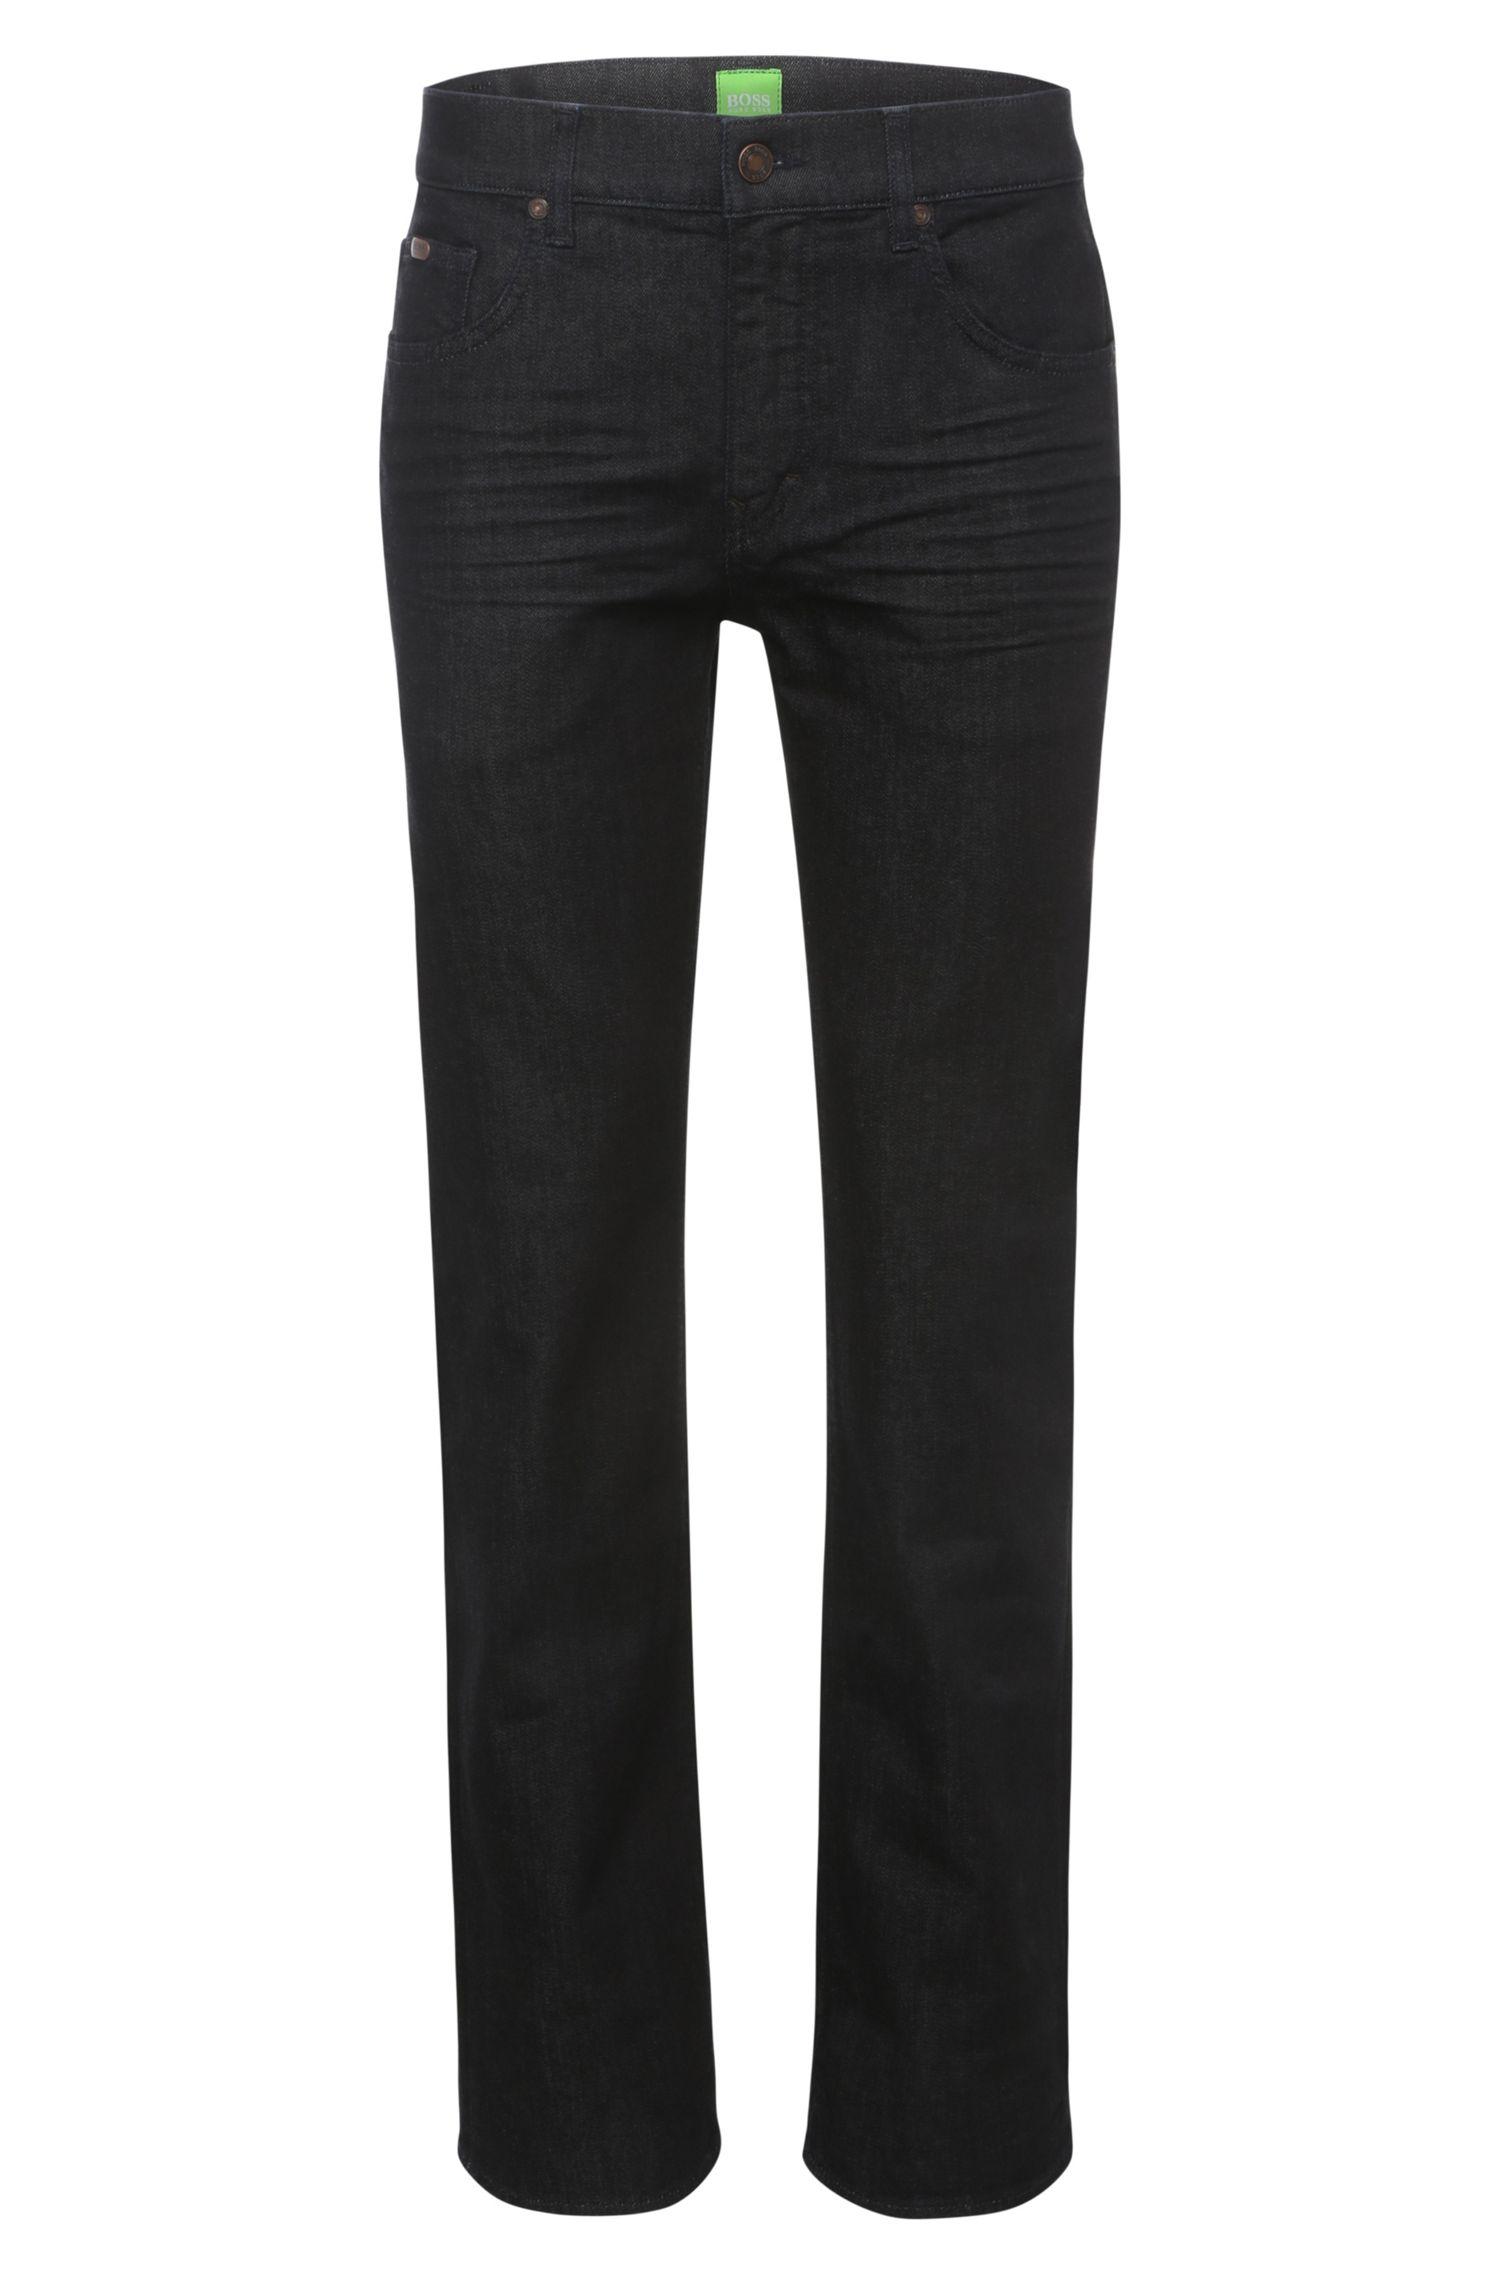 Comfort-fit jeans in stretch cotton blend: 'C-KANSAS'